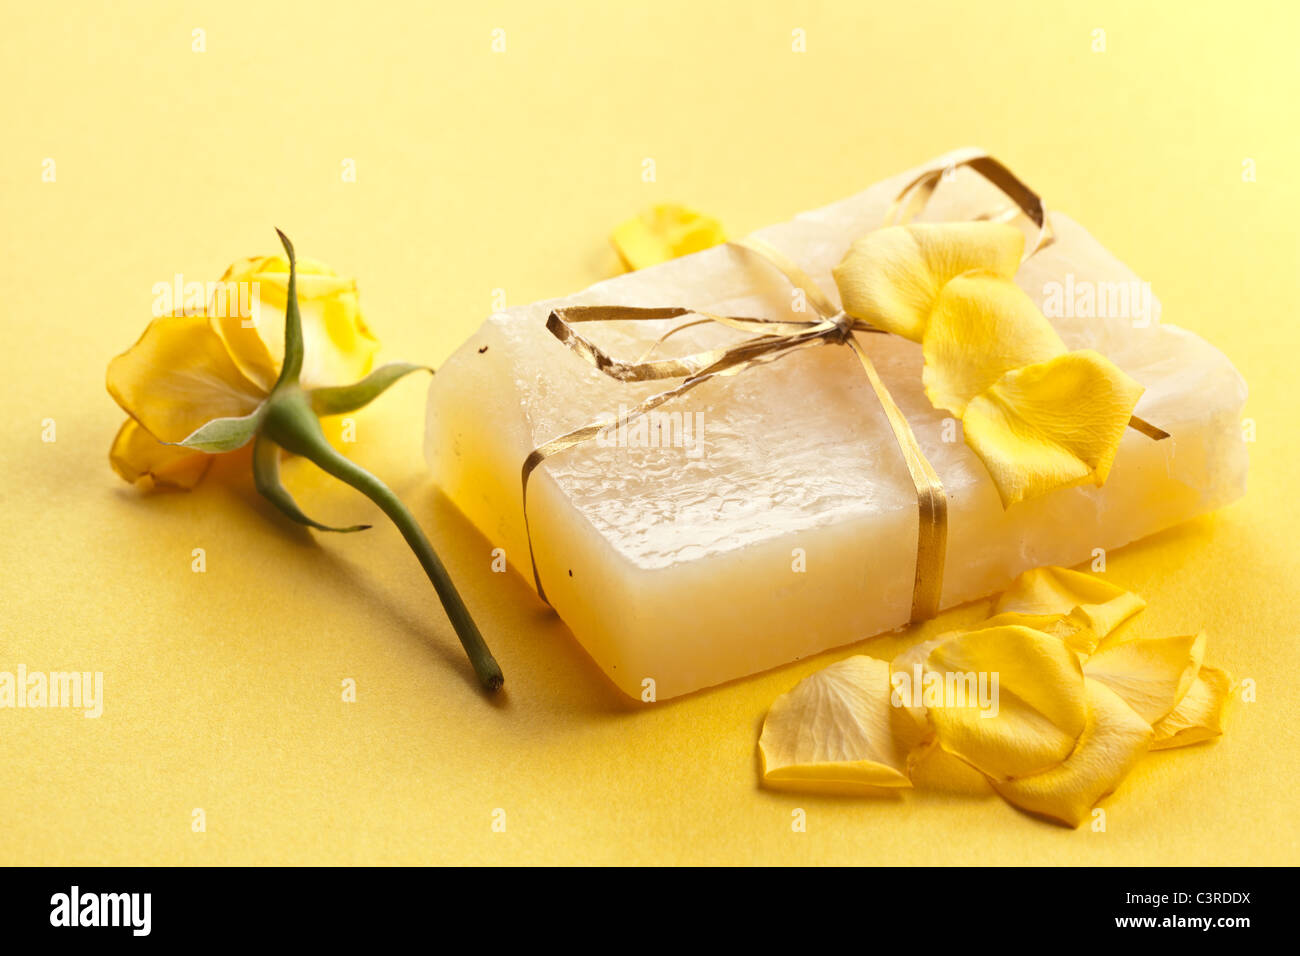 Piece of handmade flower soap. - Stock Image